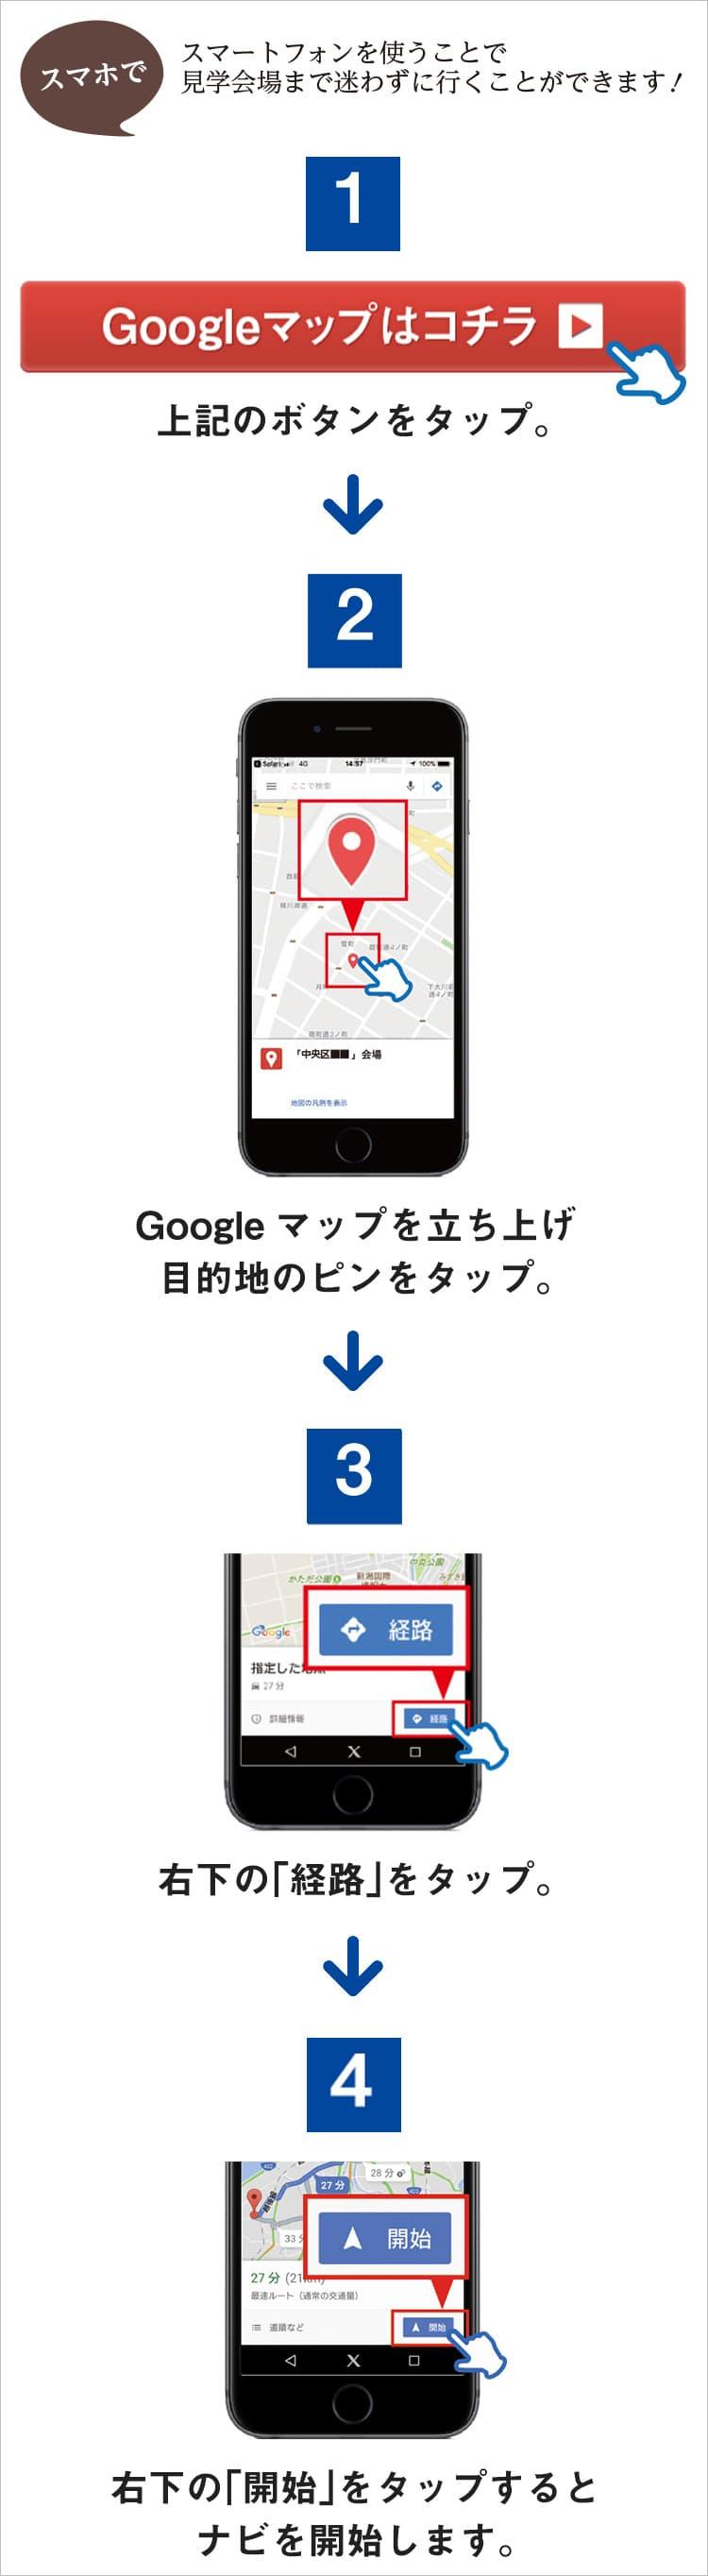 googleマップナビゲーション説明